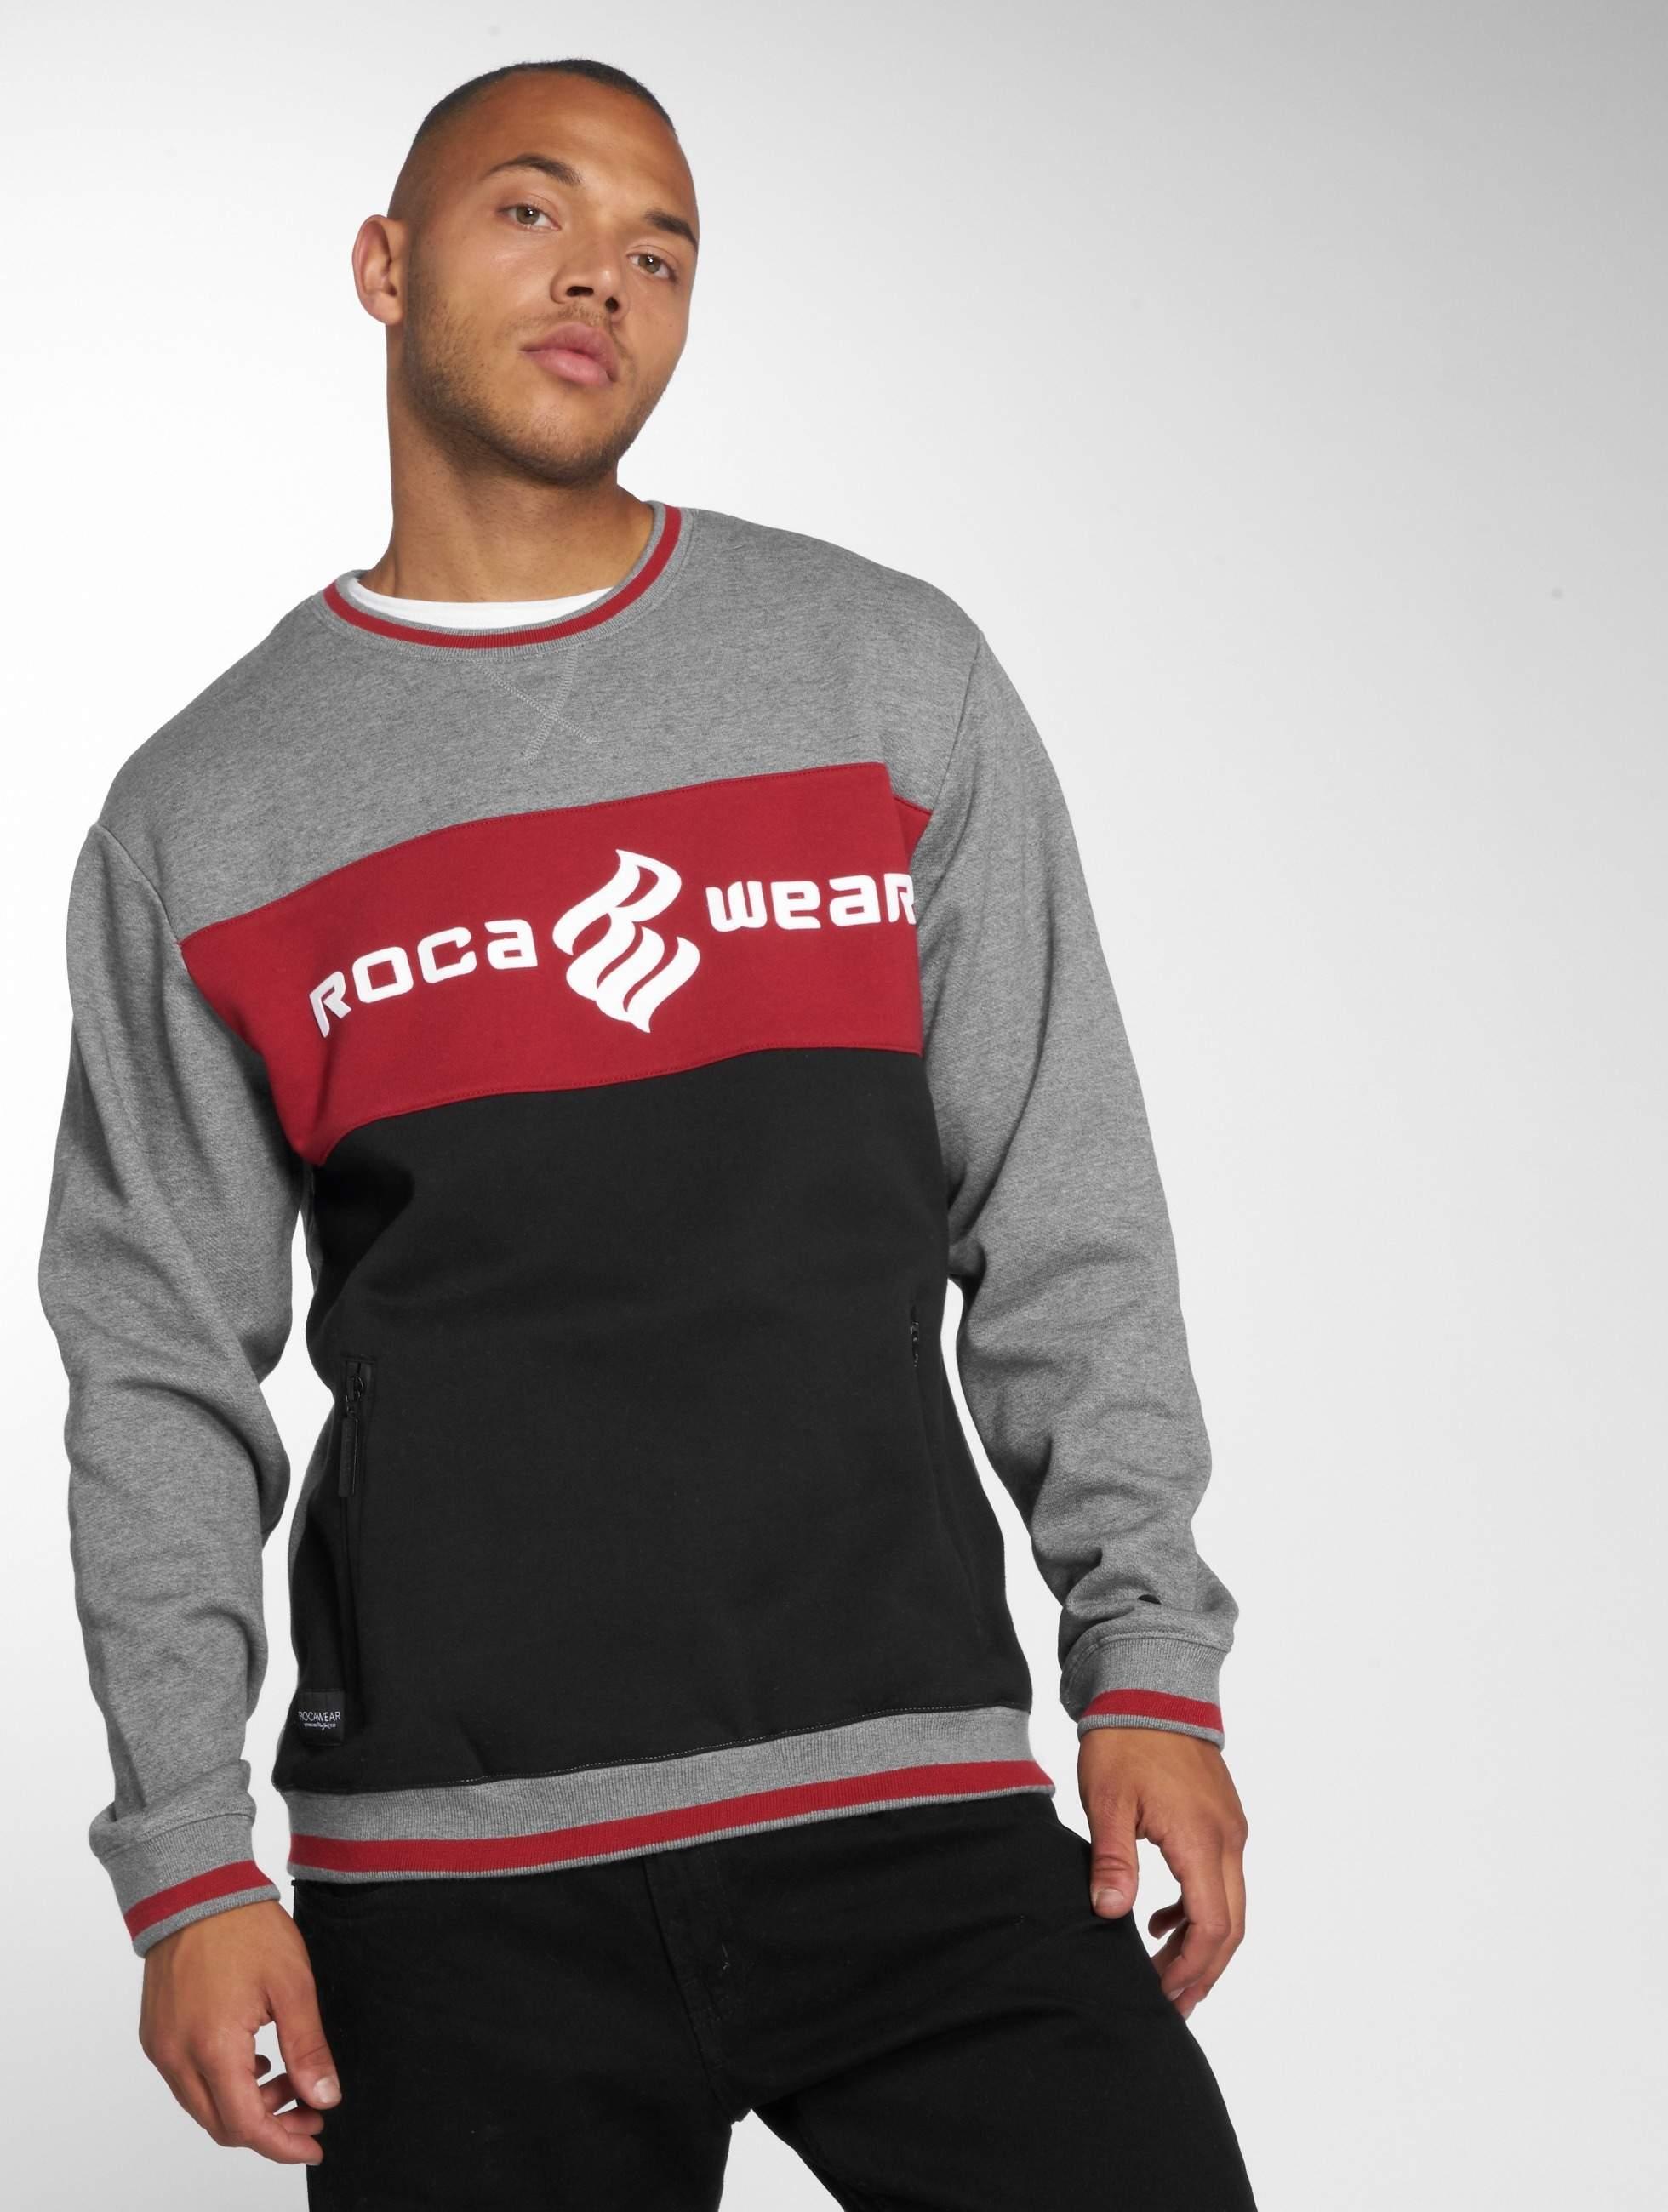 Rocawear / Jumper 3 Tone in grey M